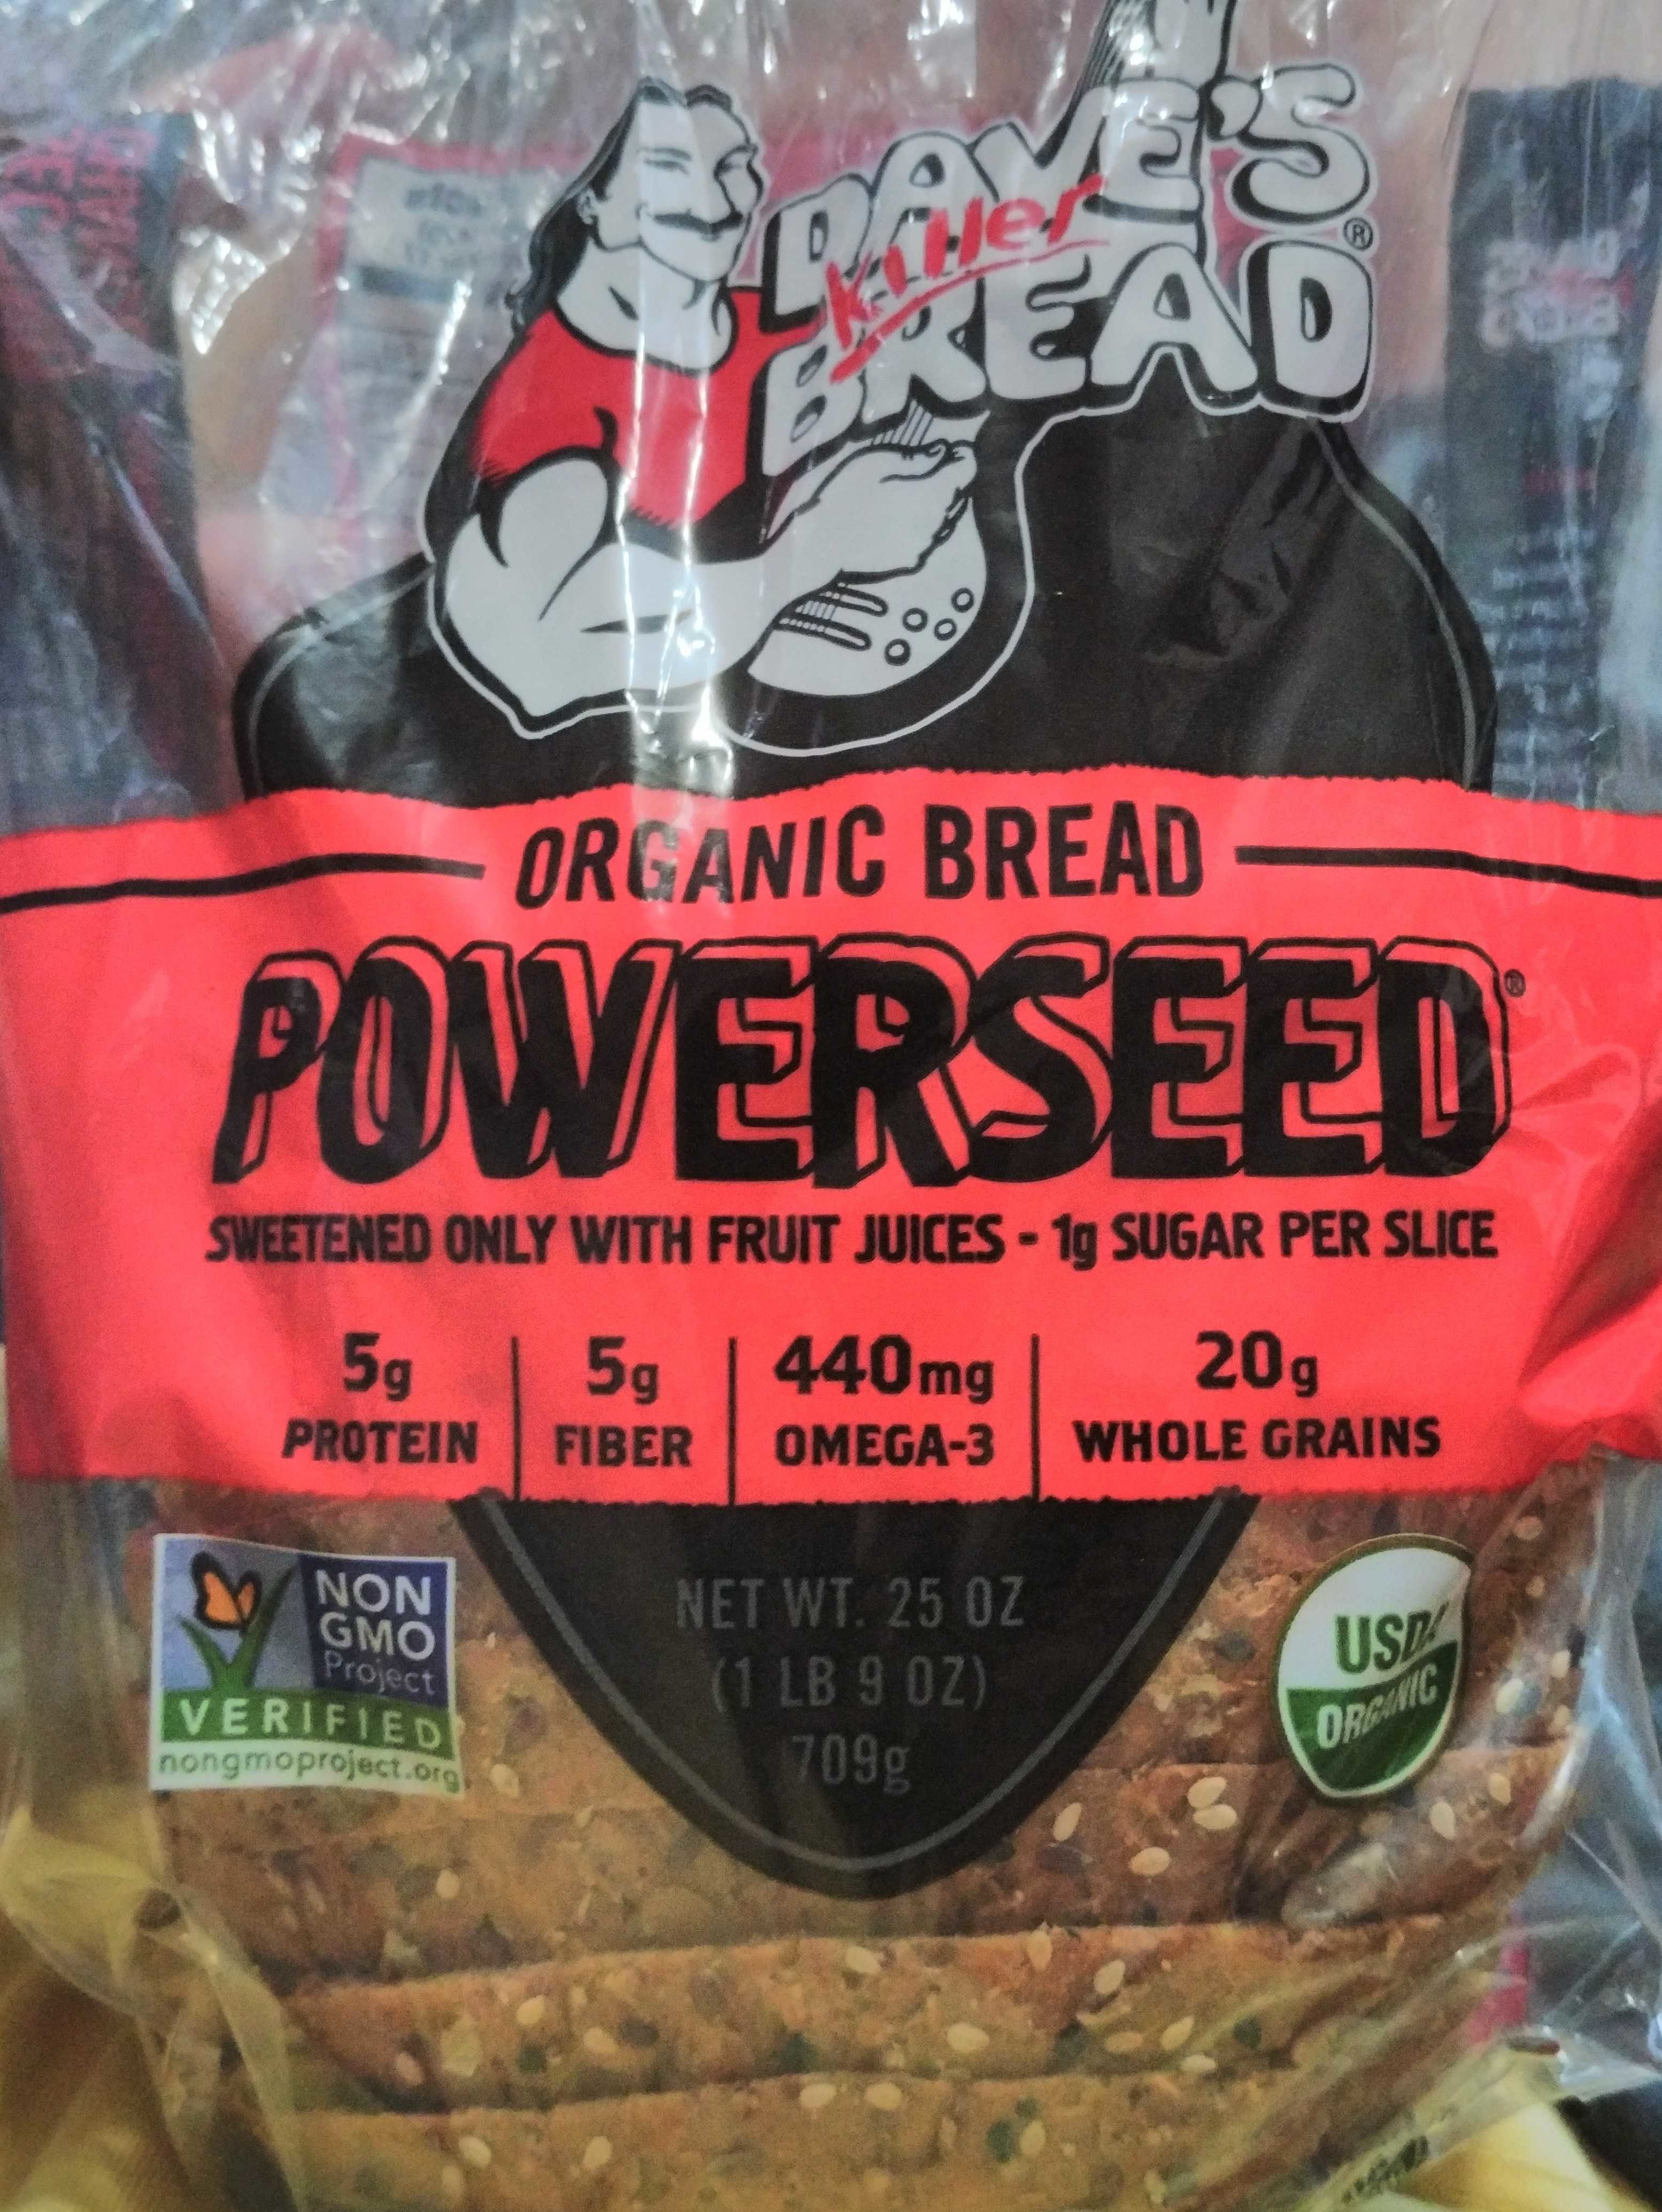 Powerseed (Organic Bread) - Product - en